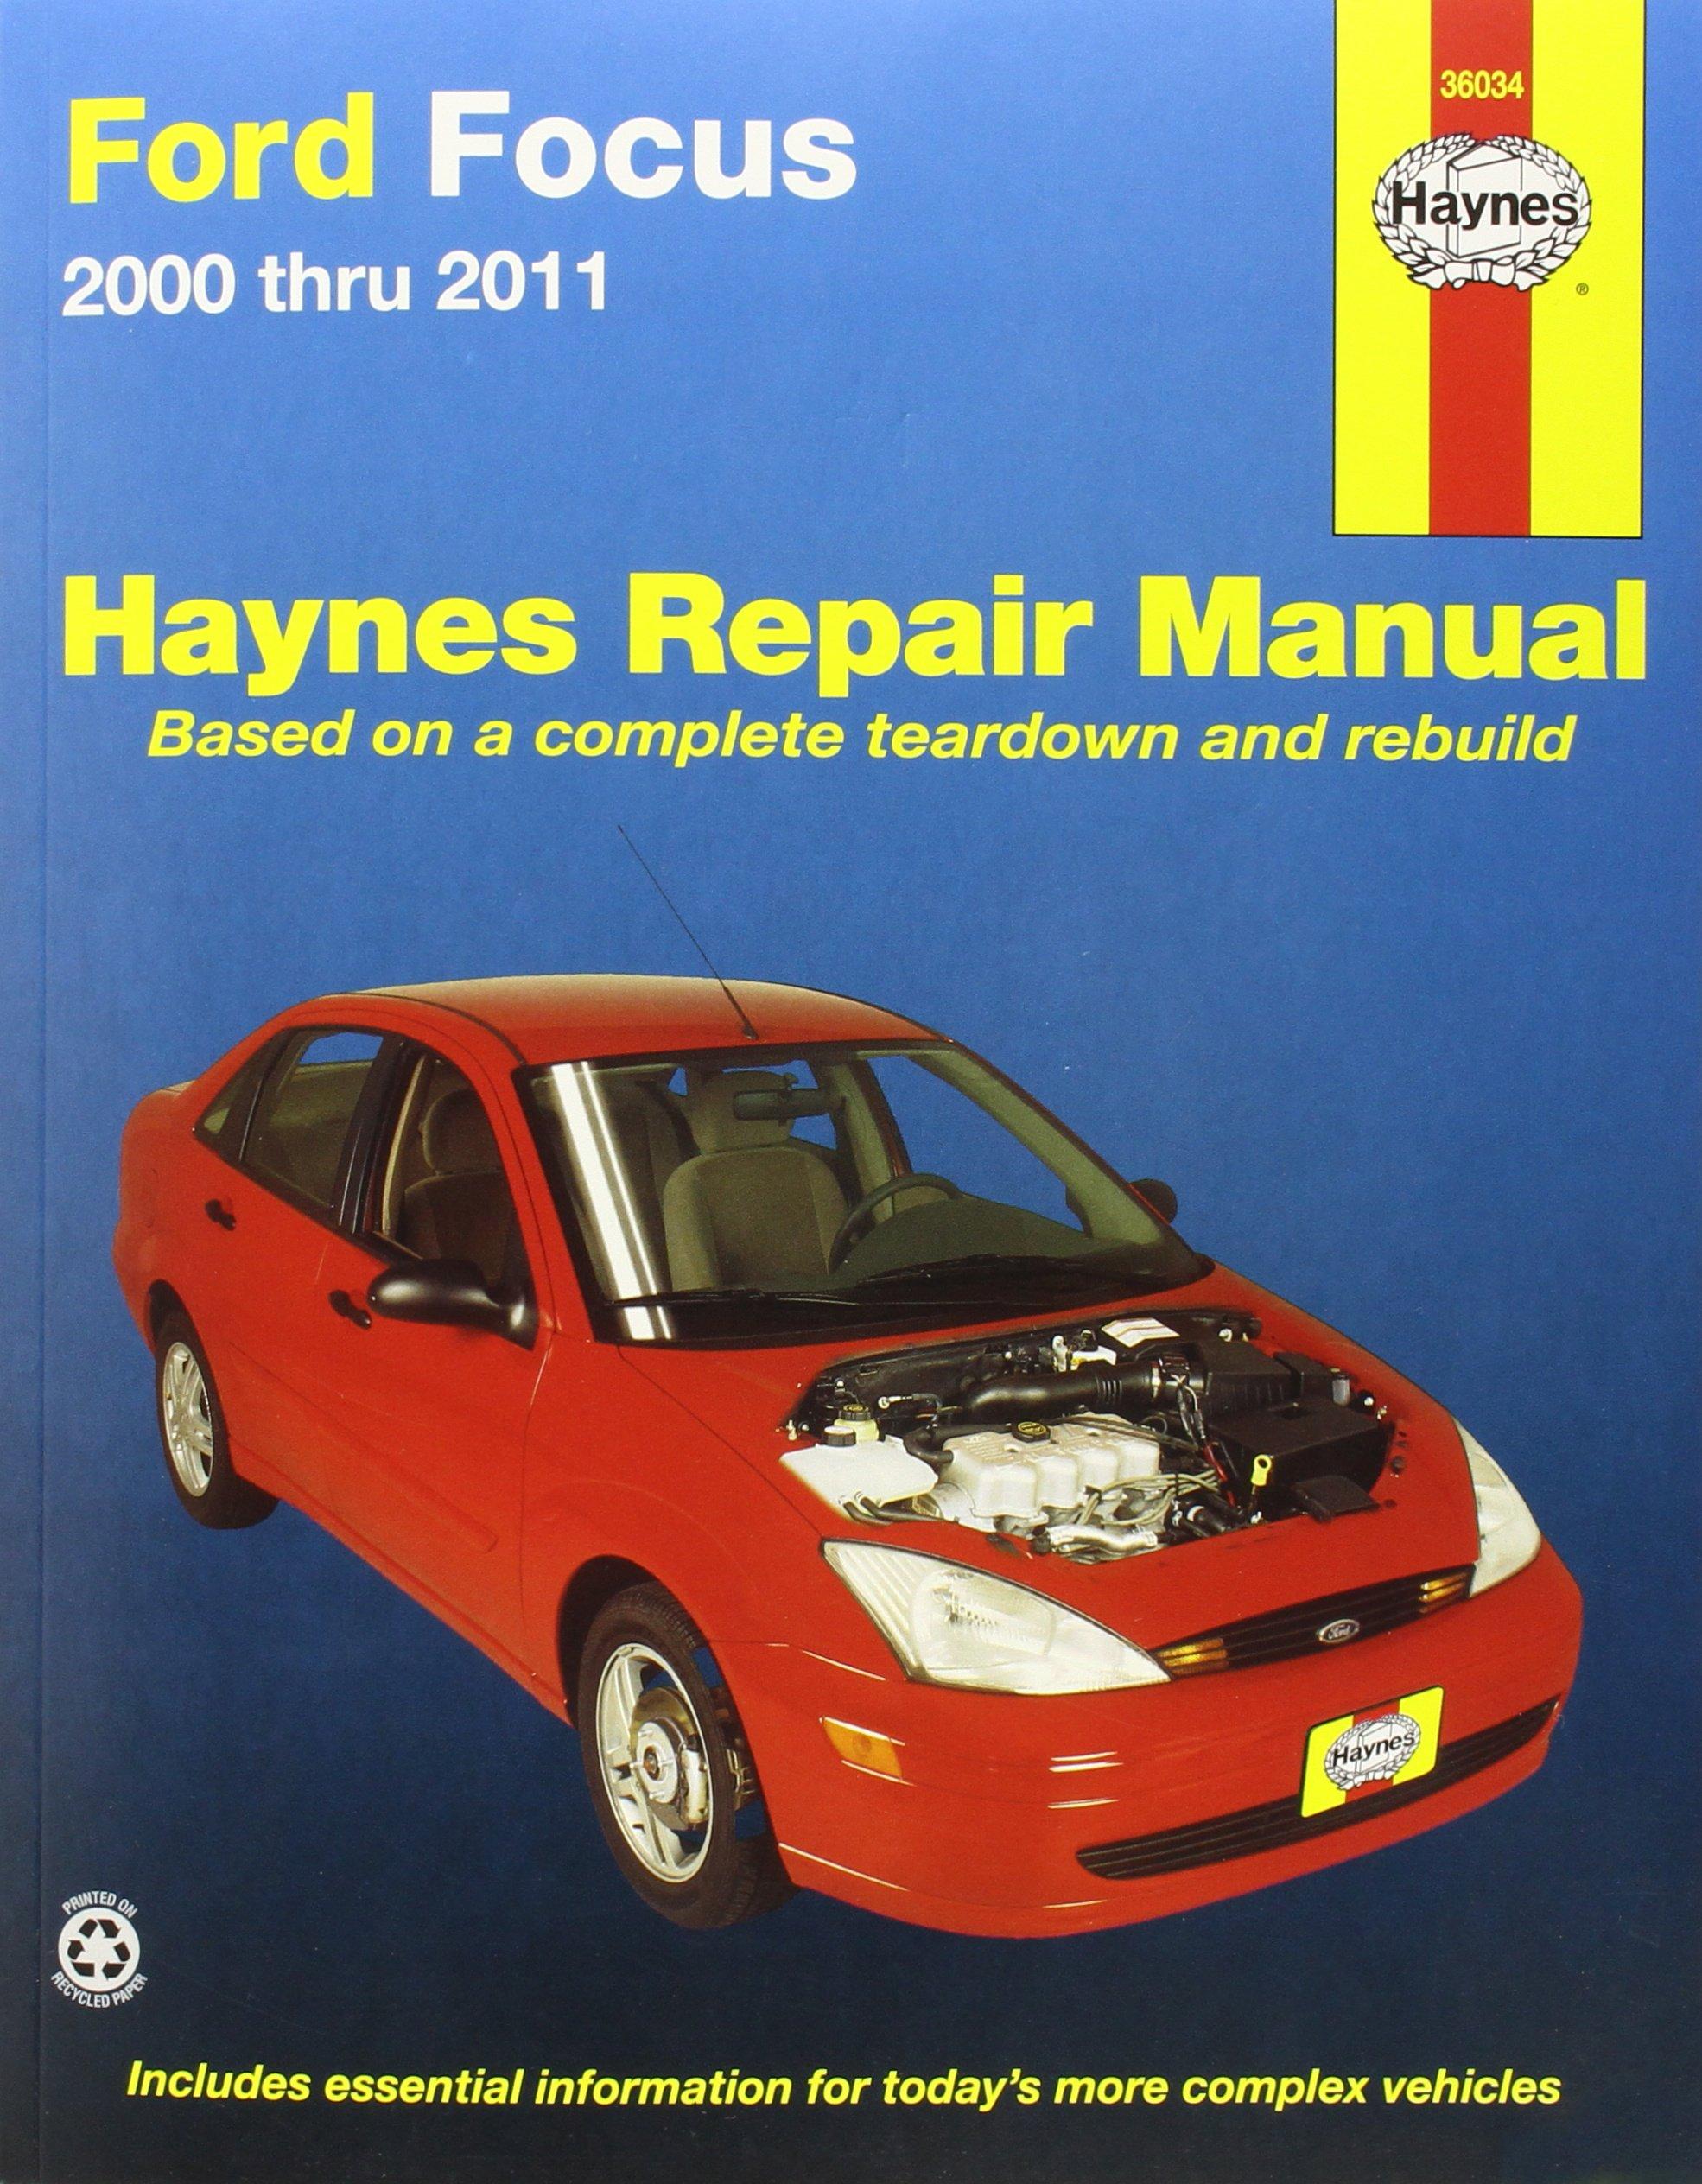 Ford focus automotive repair manual 2000 2007 haynes automotive repair manuals amazon co uk max haynes 9781620920008 books